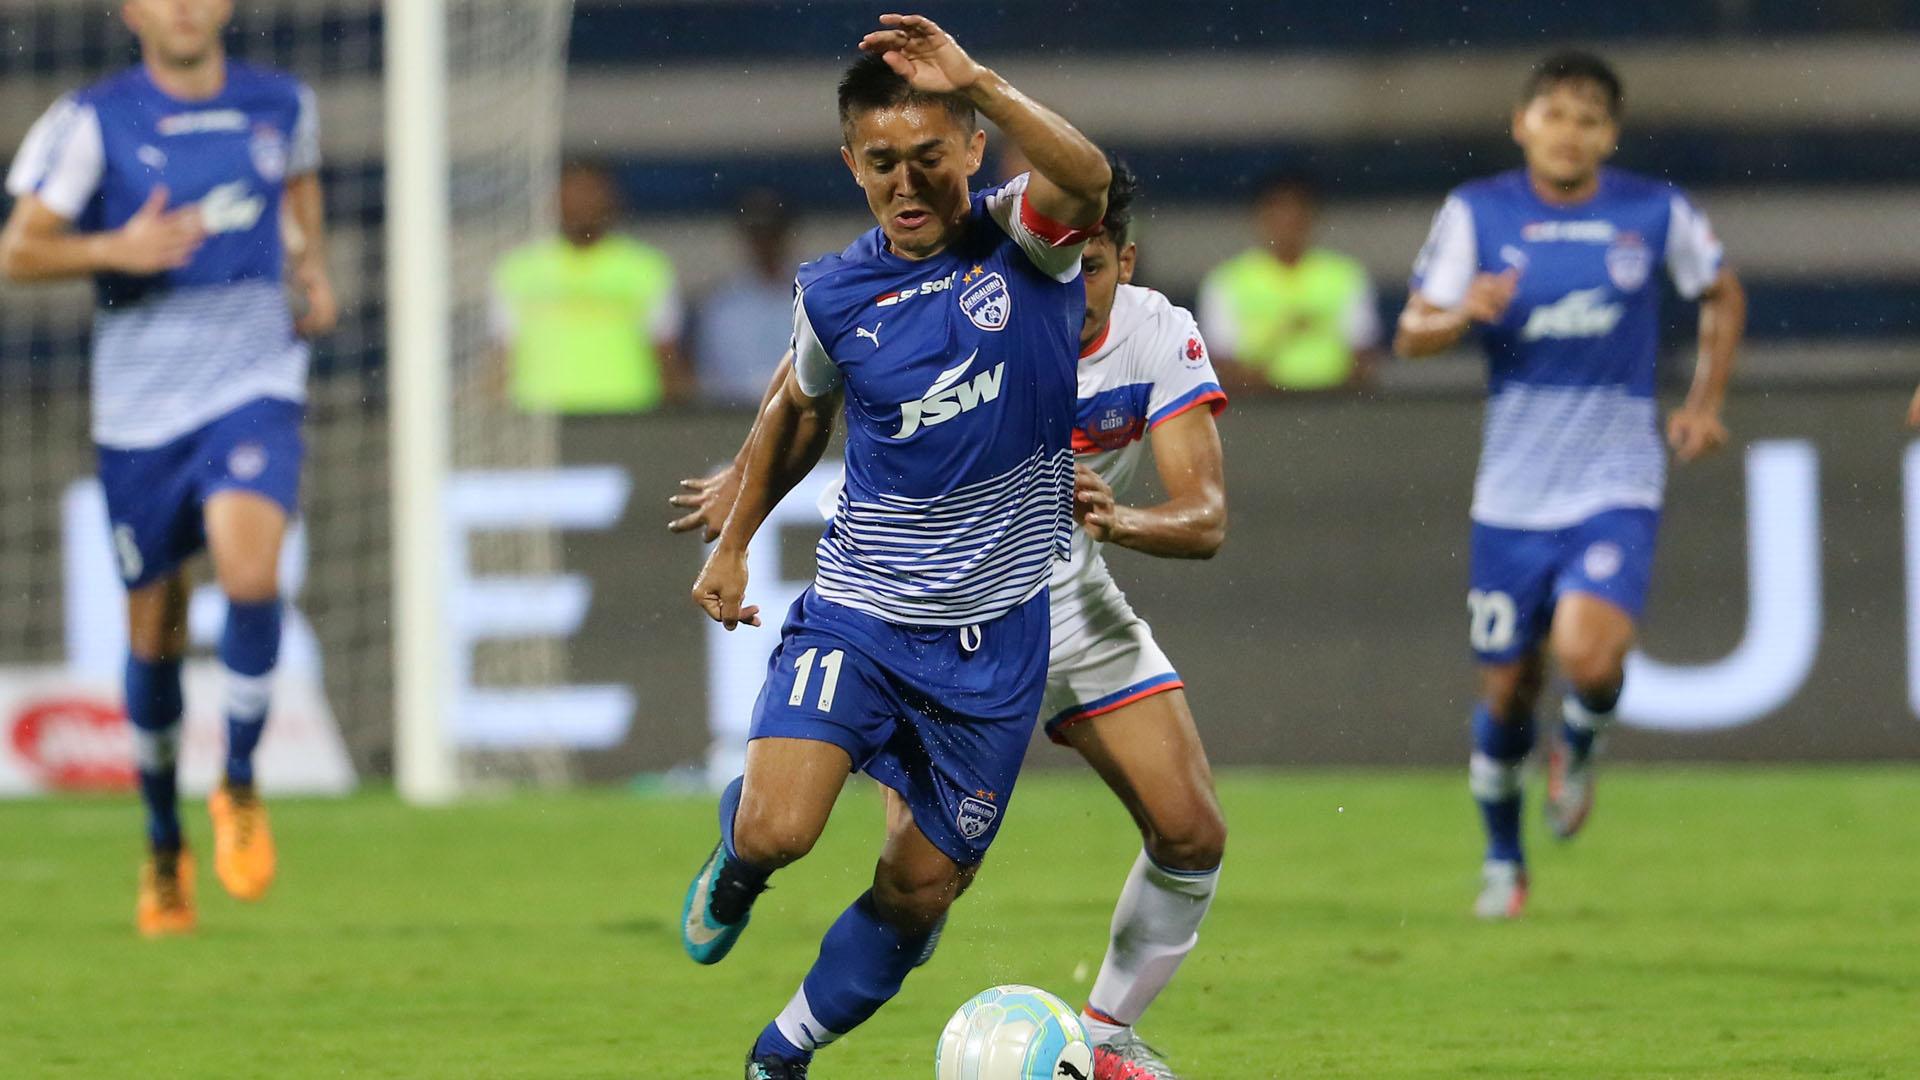 Sunil Chhetri Bengaluru FC FC Goa ISL 4 2017/2018